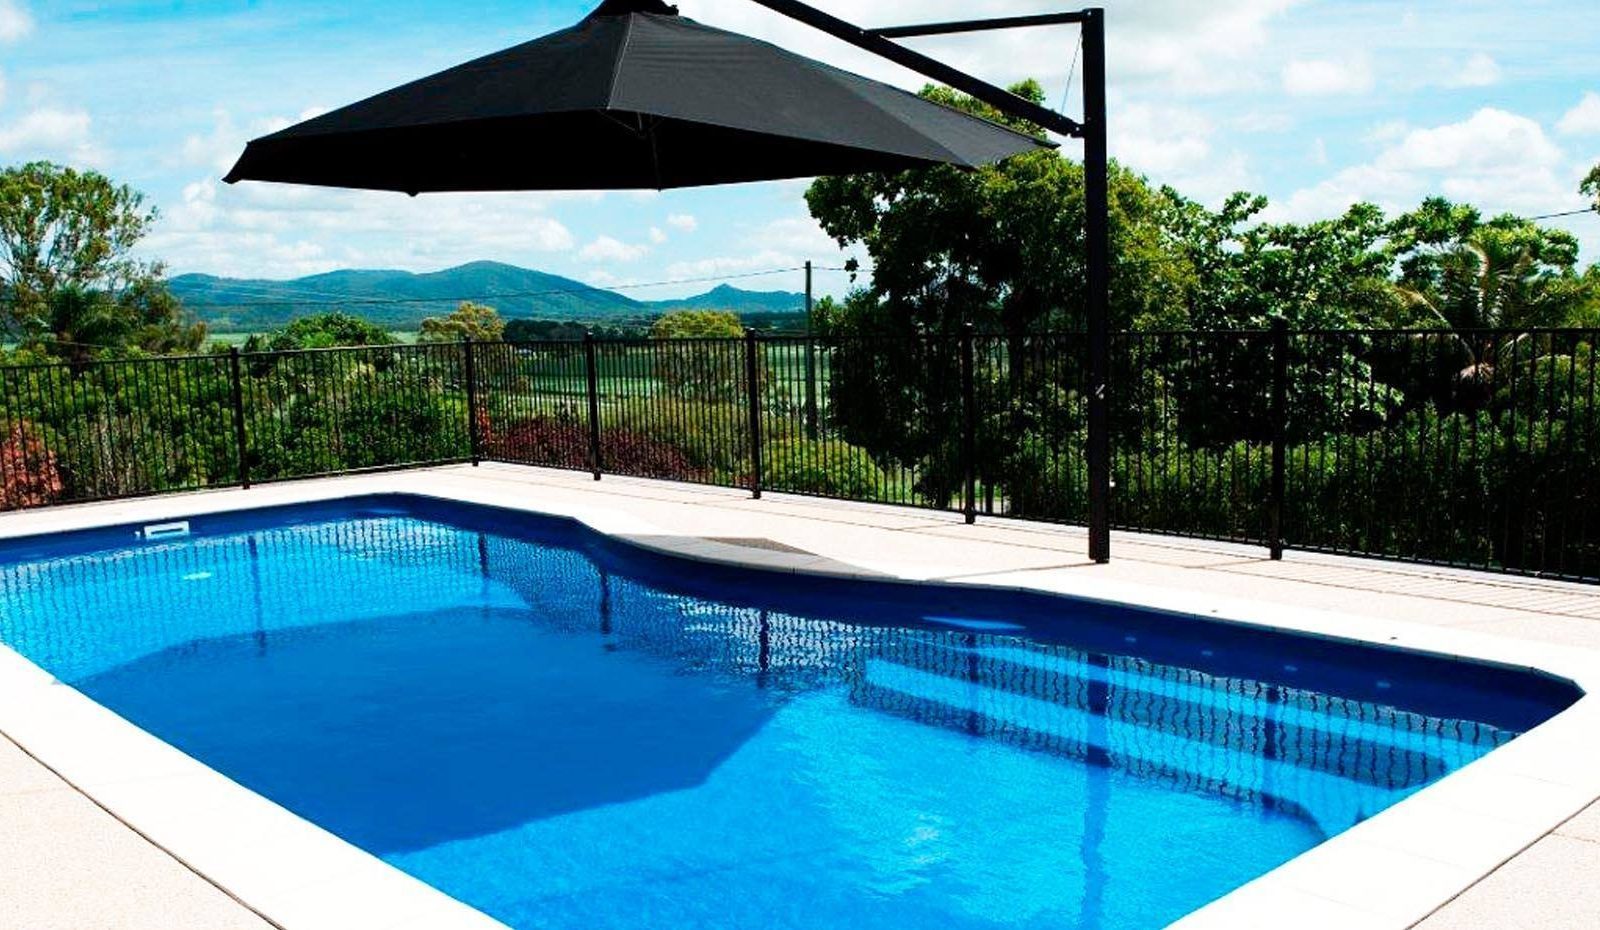 Moroccan Fibreglass Pool By Toronto Pool Builder M E Contracting